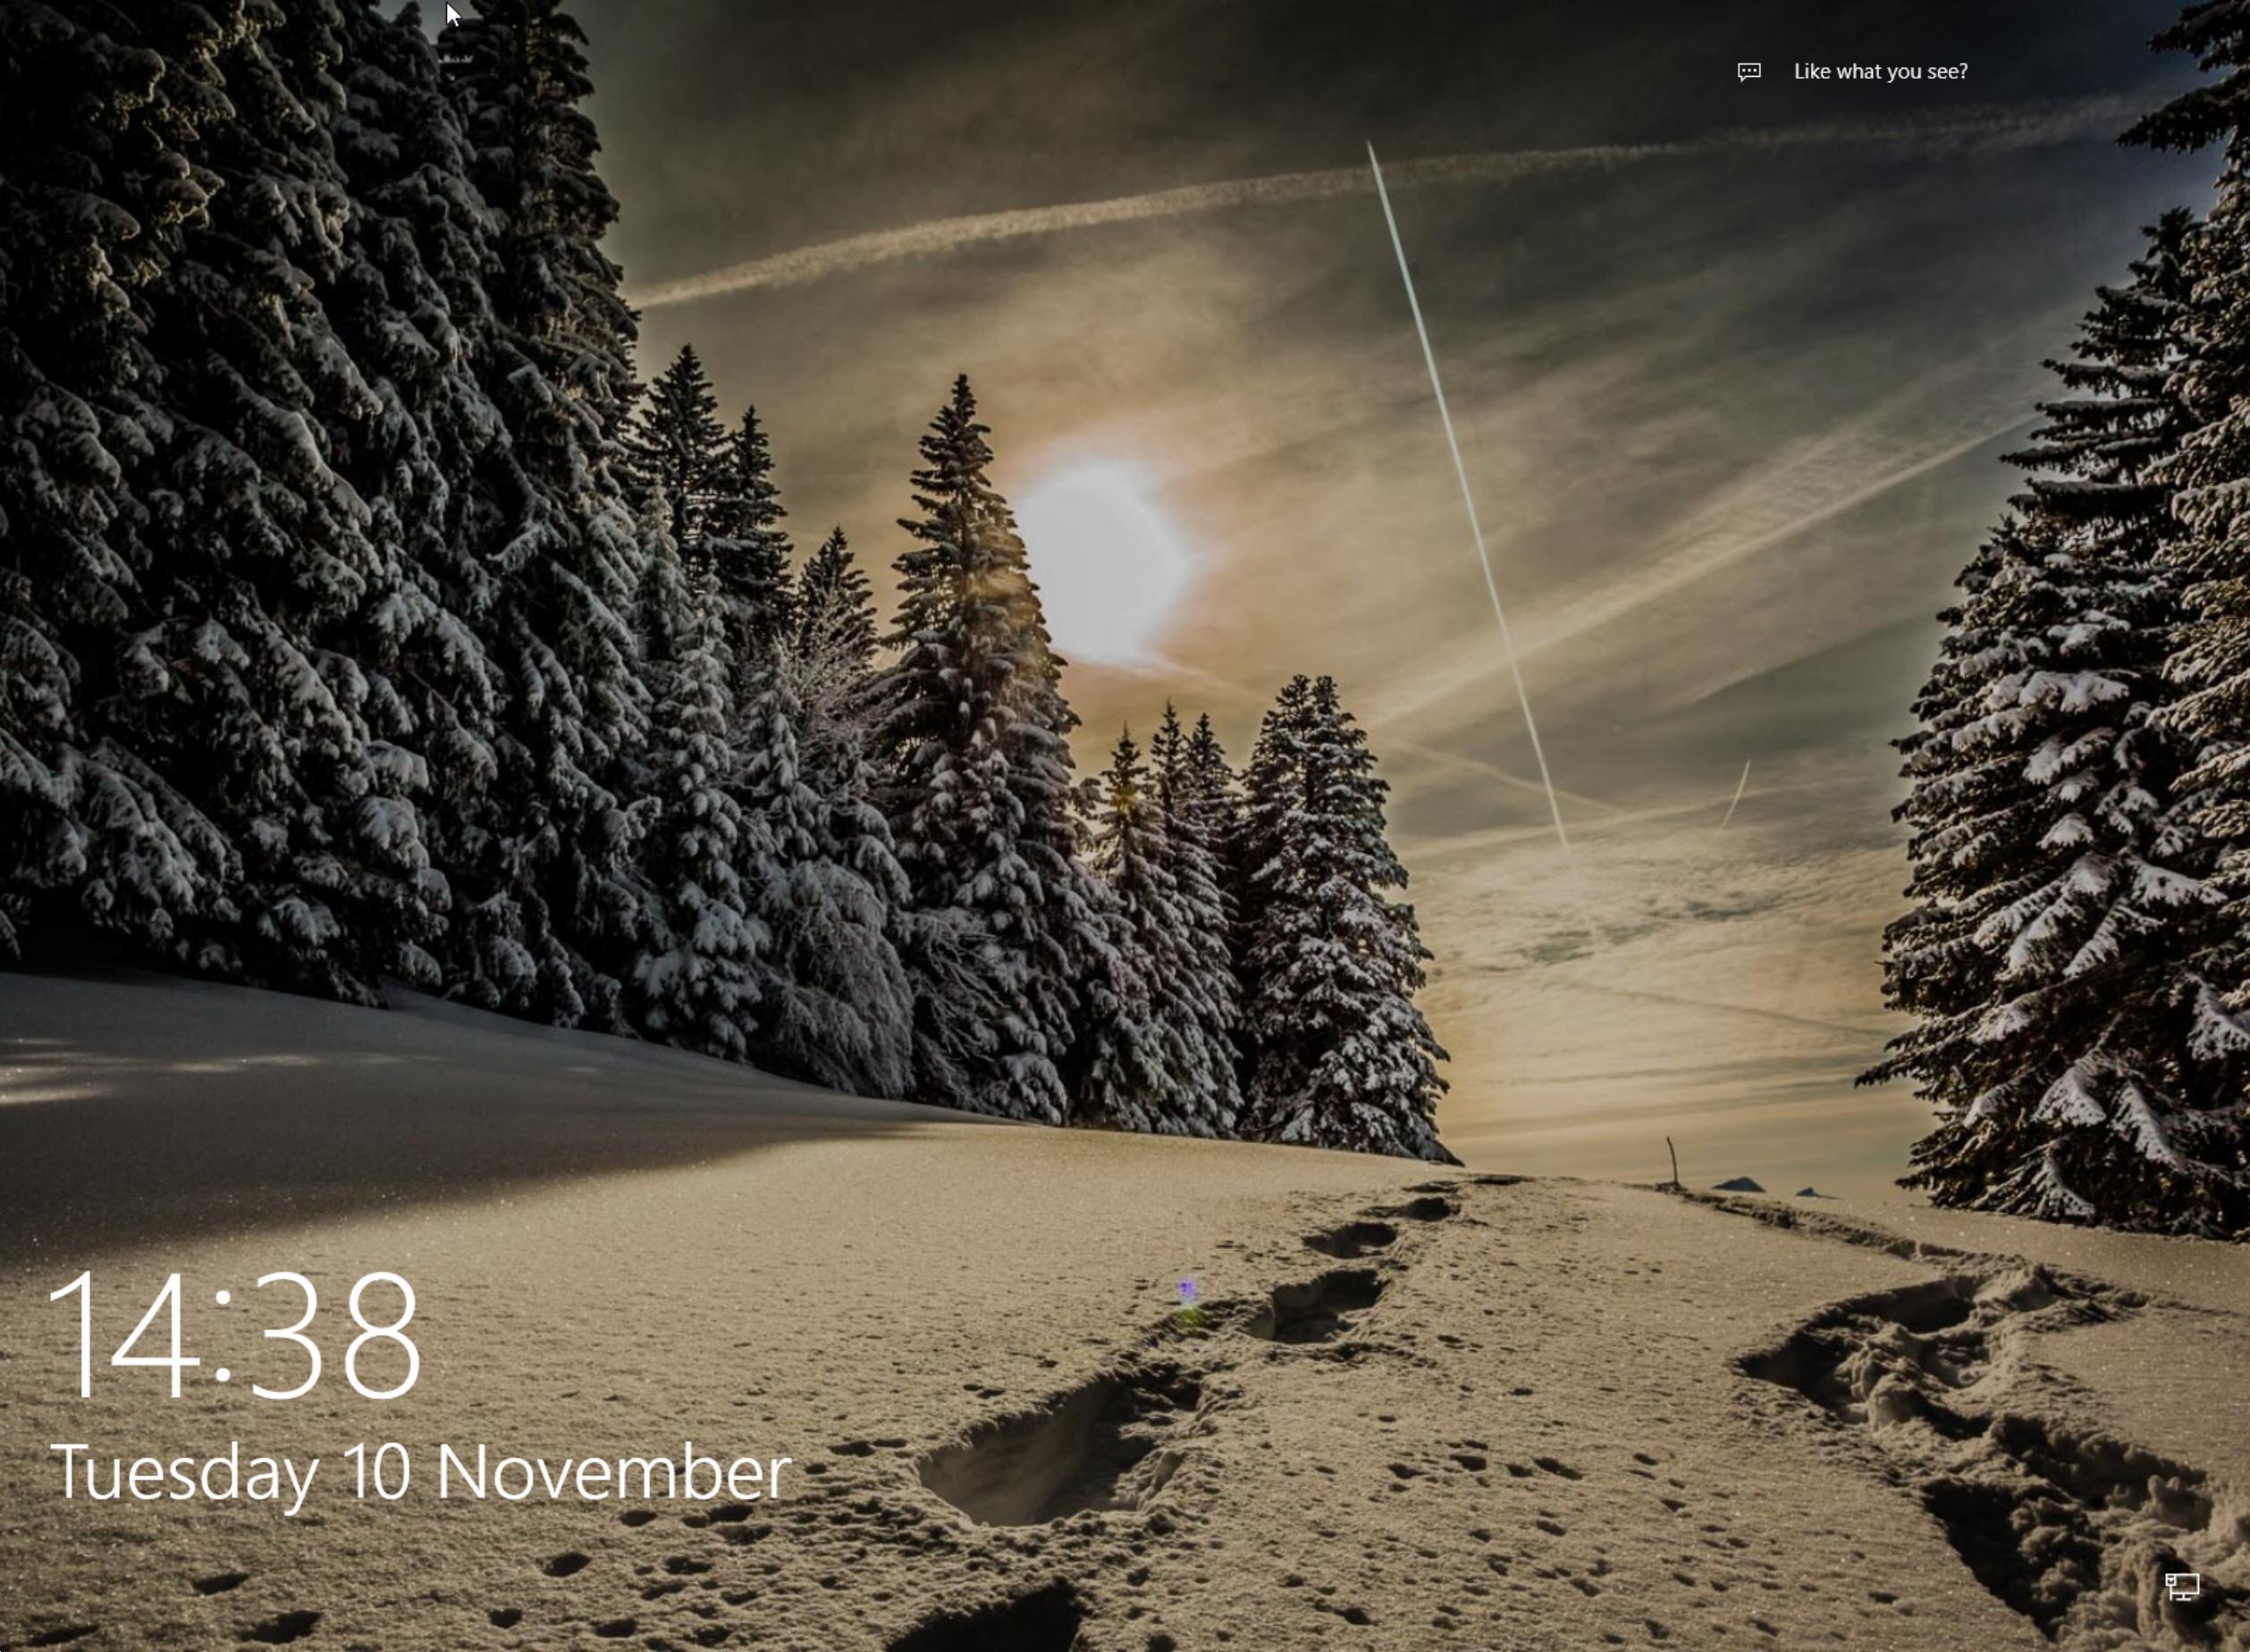 Lock screen improvements 2517x1848